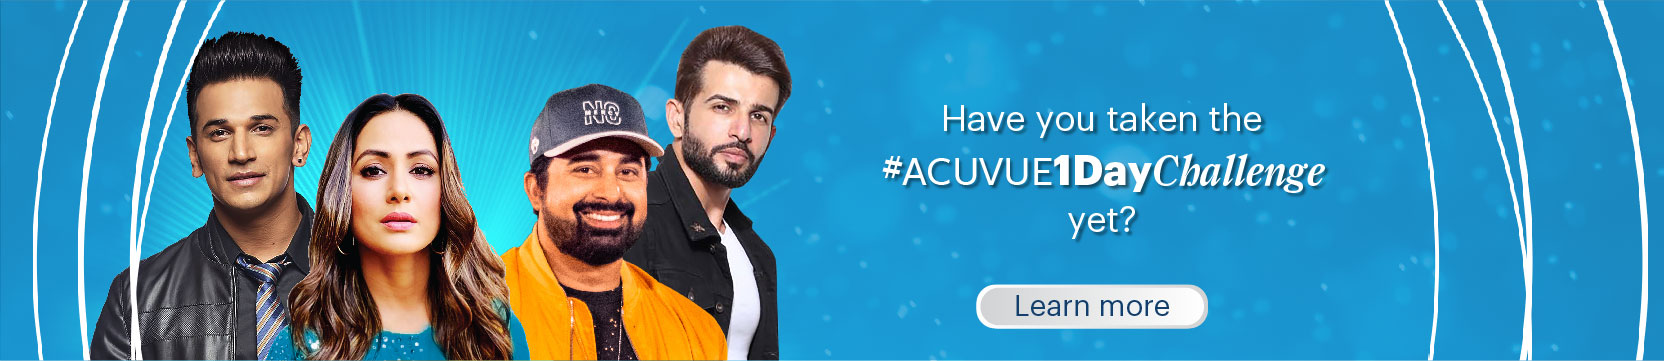 acuvue-1day-challenge-banner.jpg